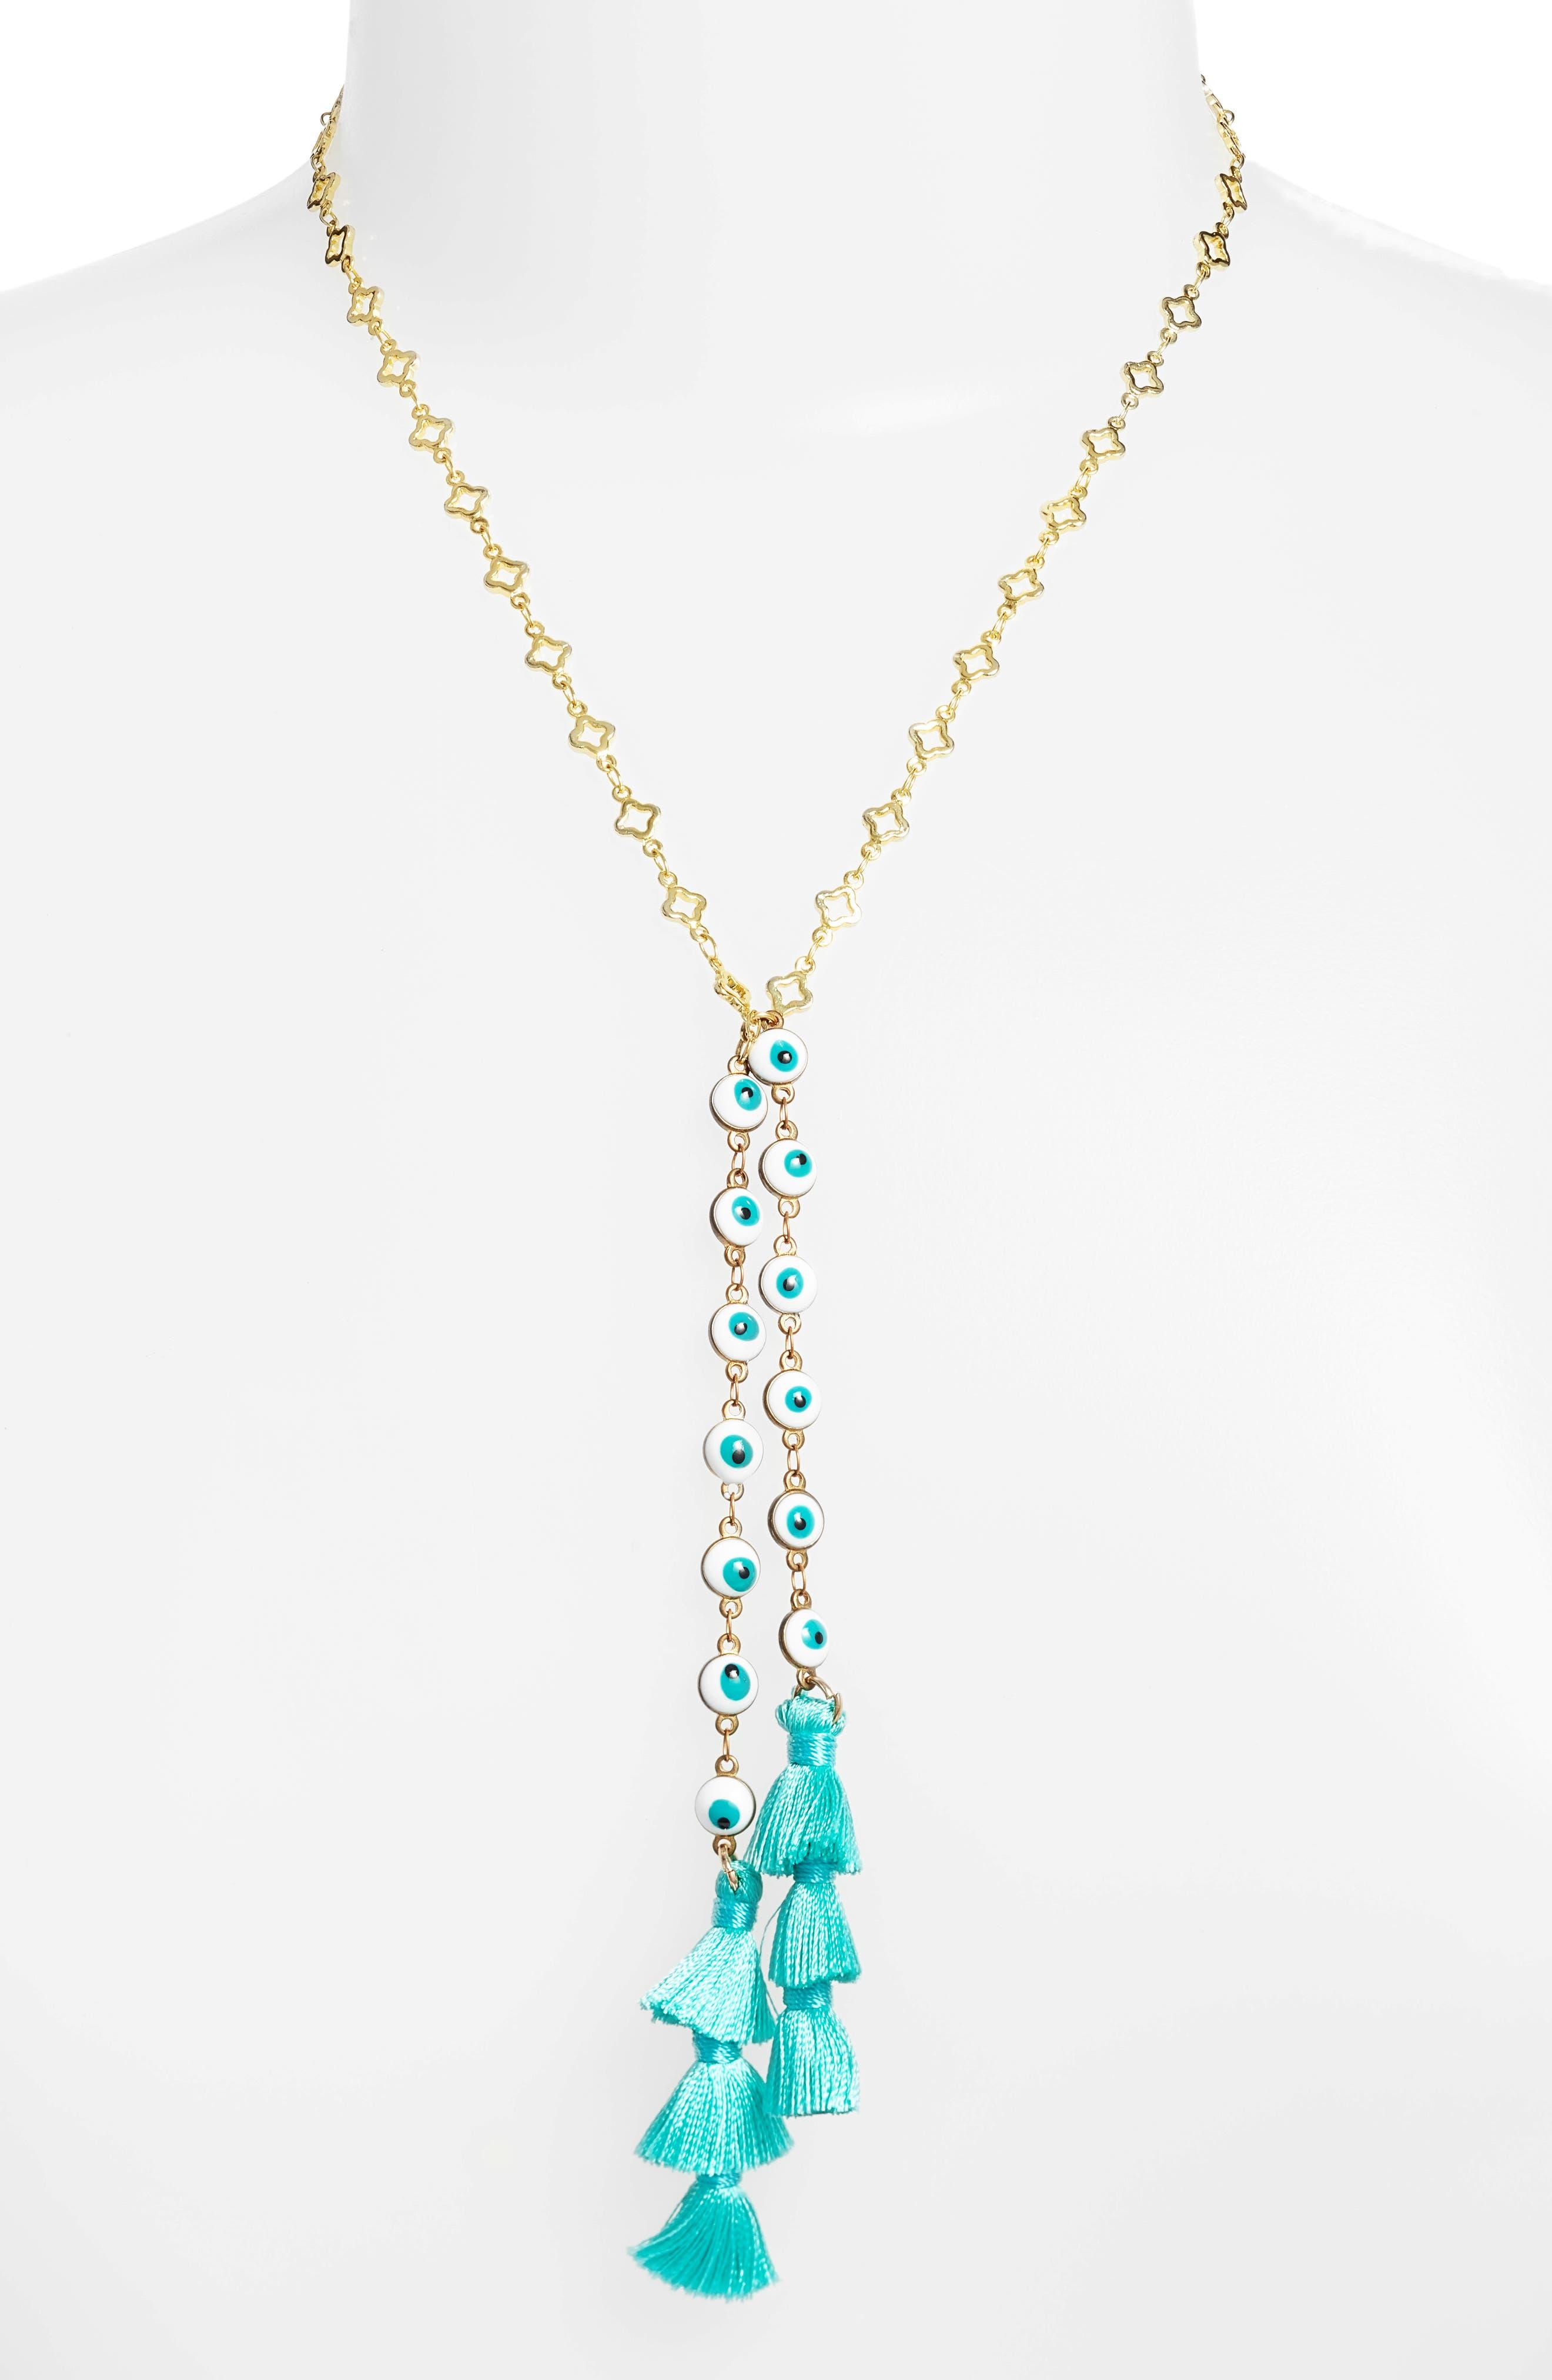 Trieste Bolo Necklace,                         Main,                         color, 710